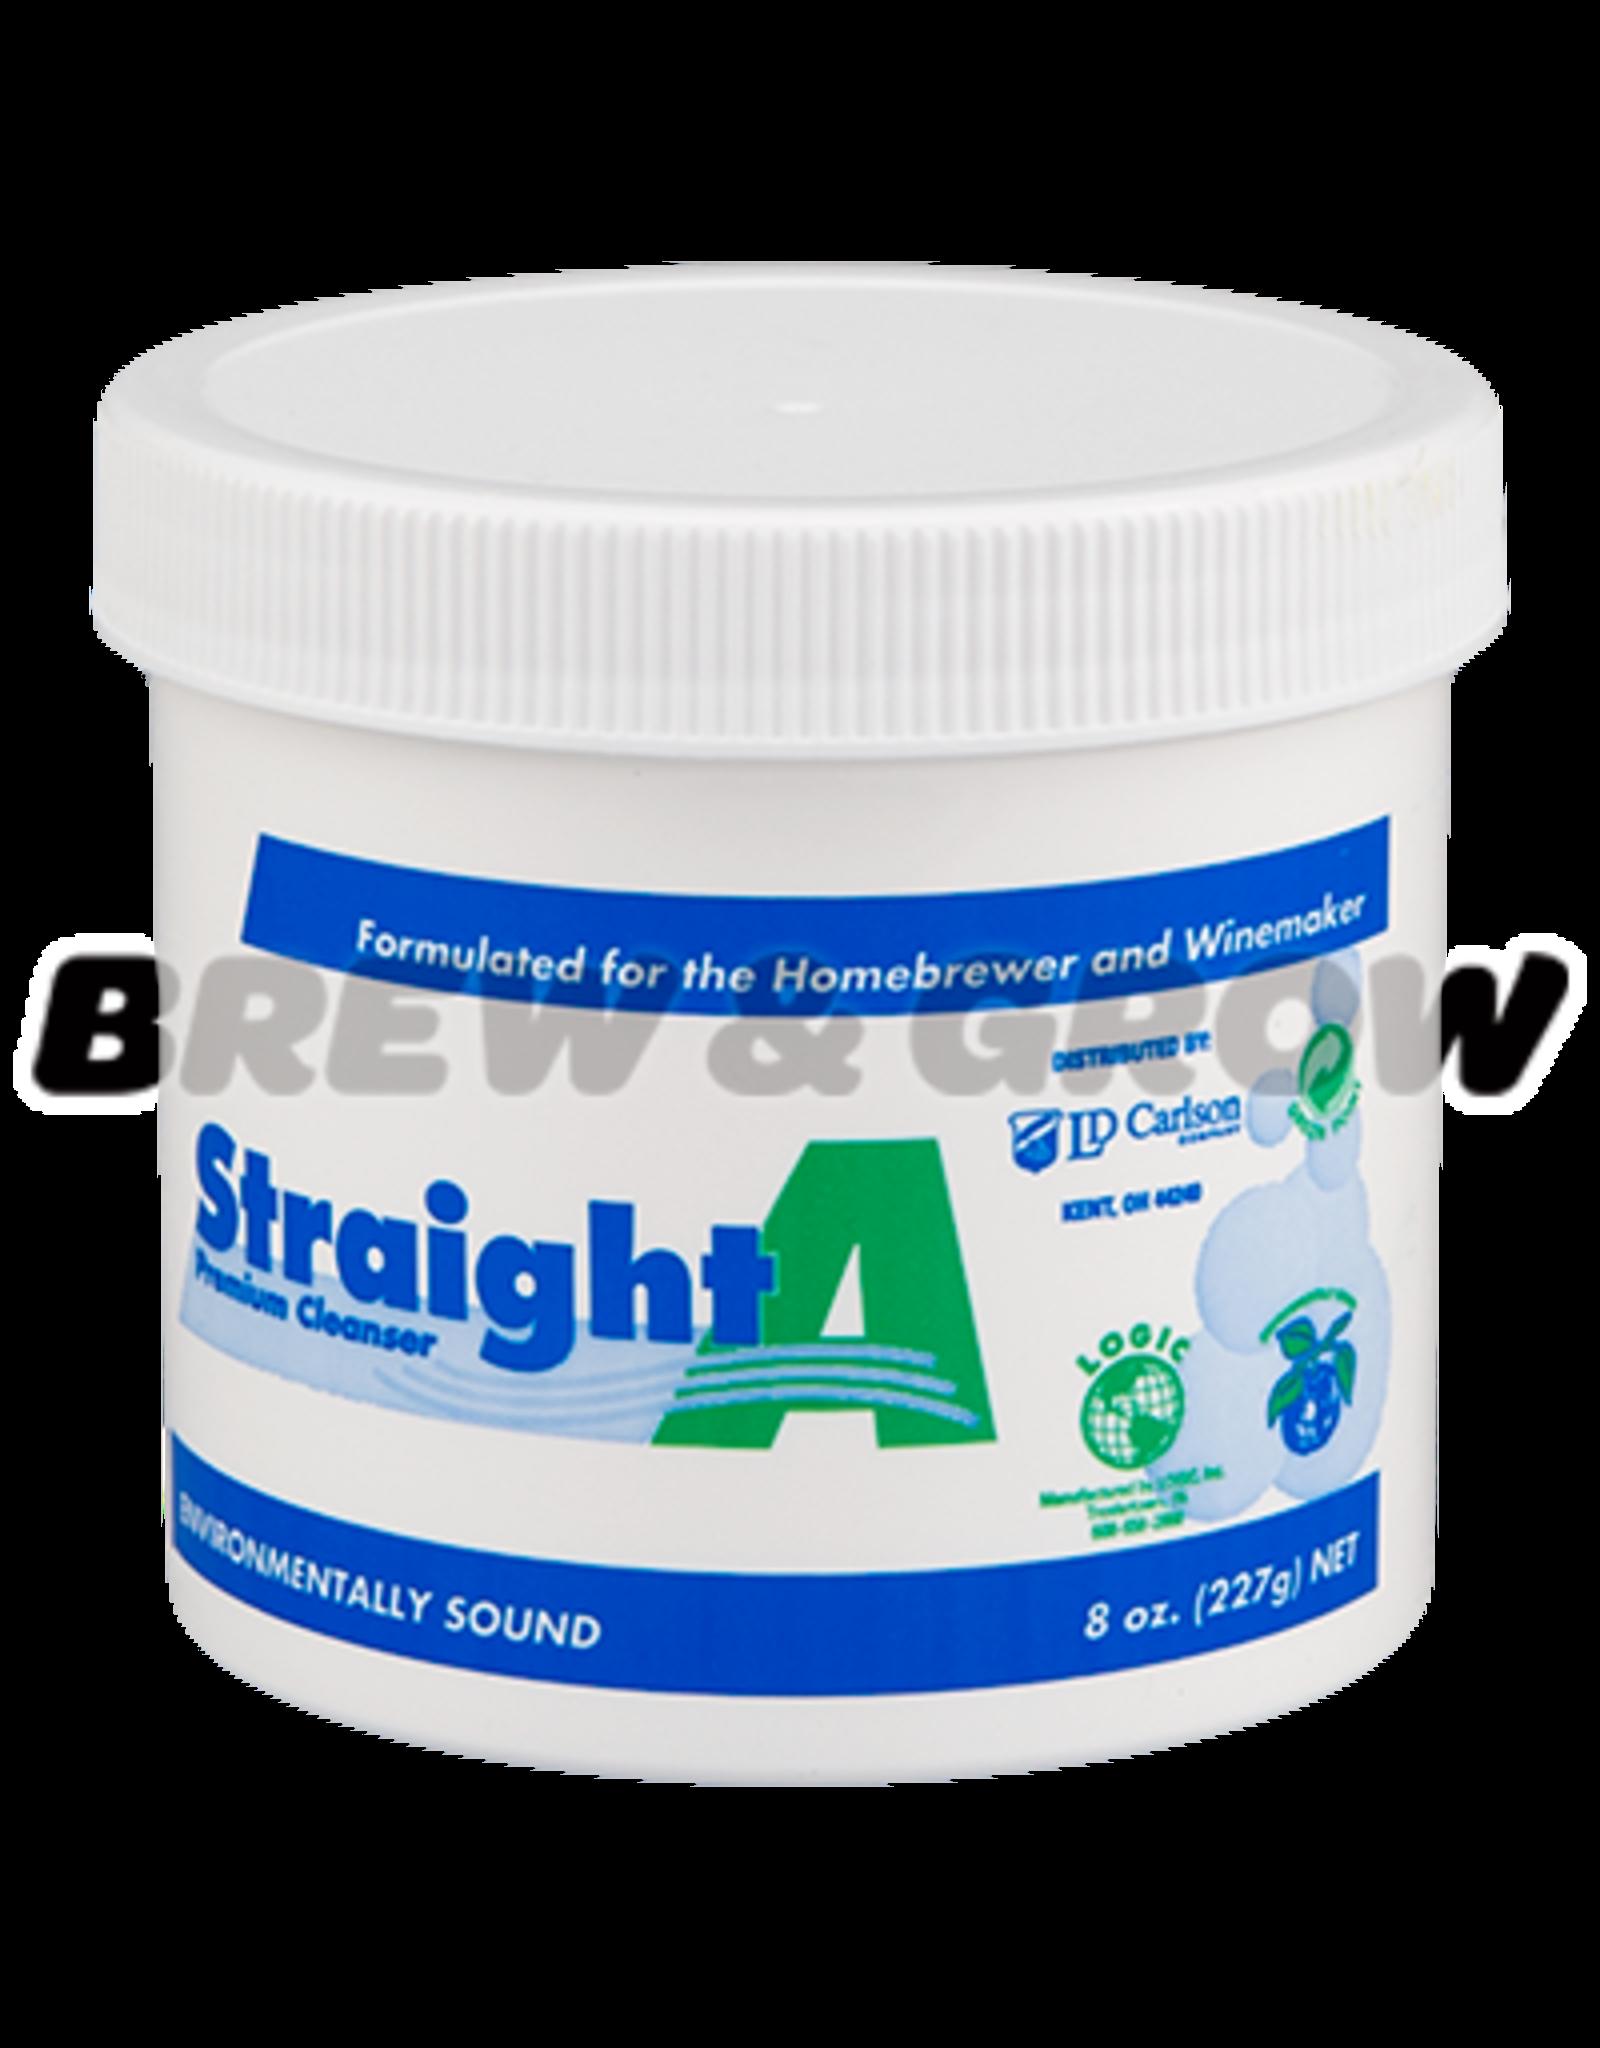 Straight-A Prem Cleanser 8 oz